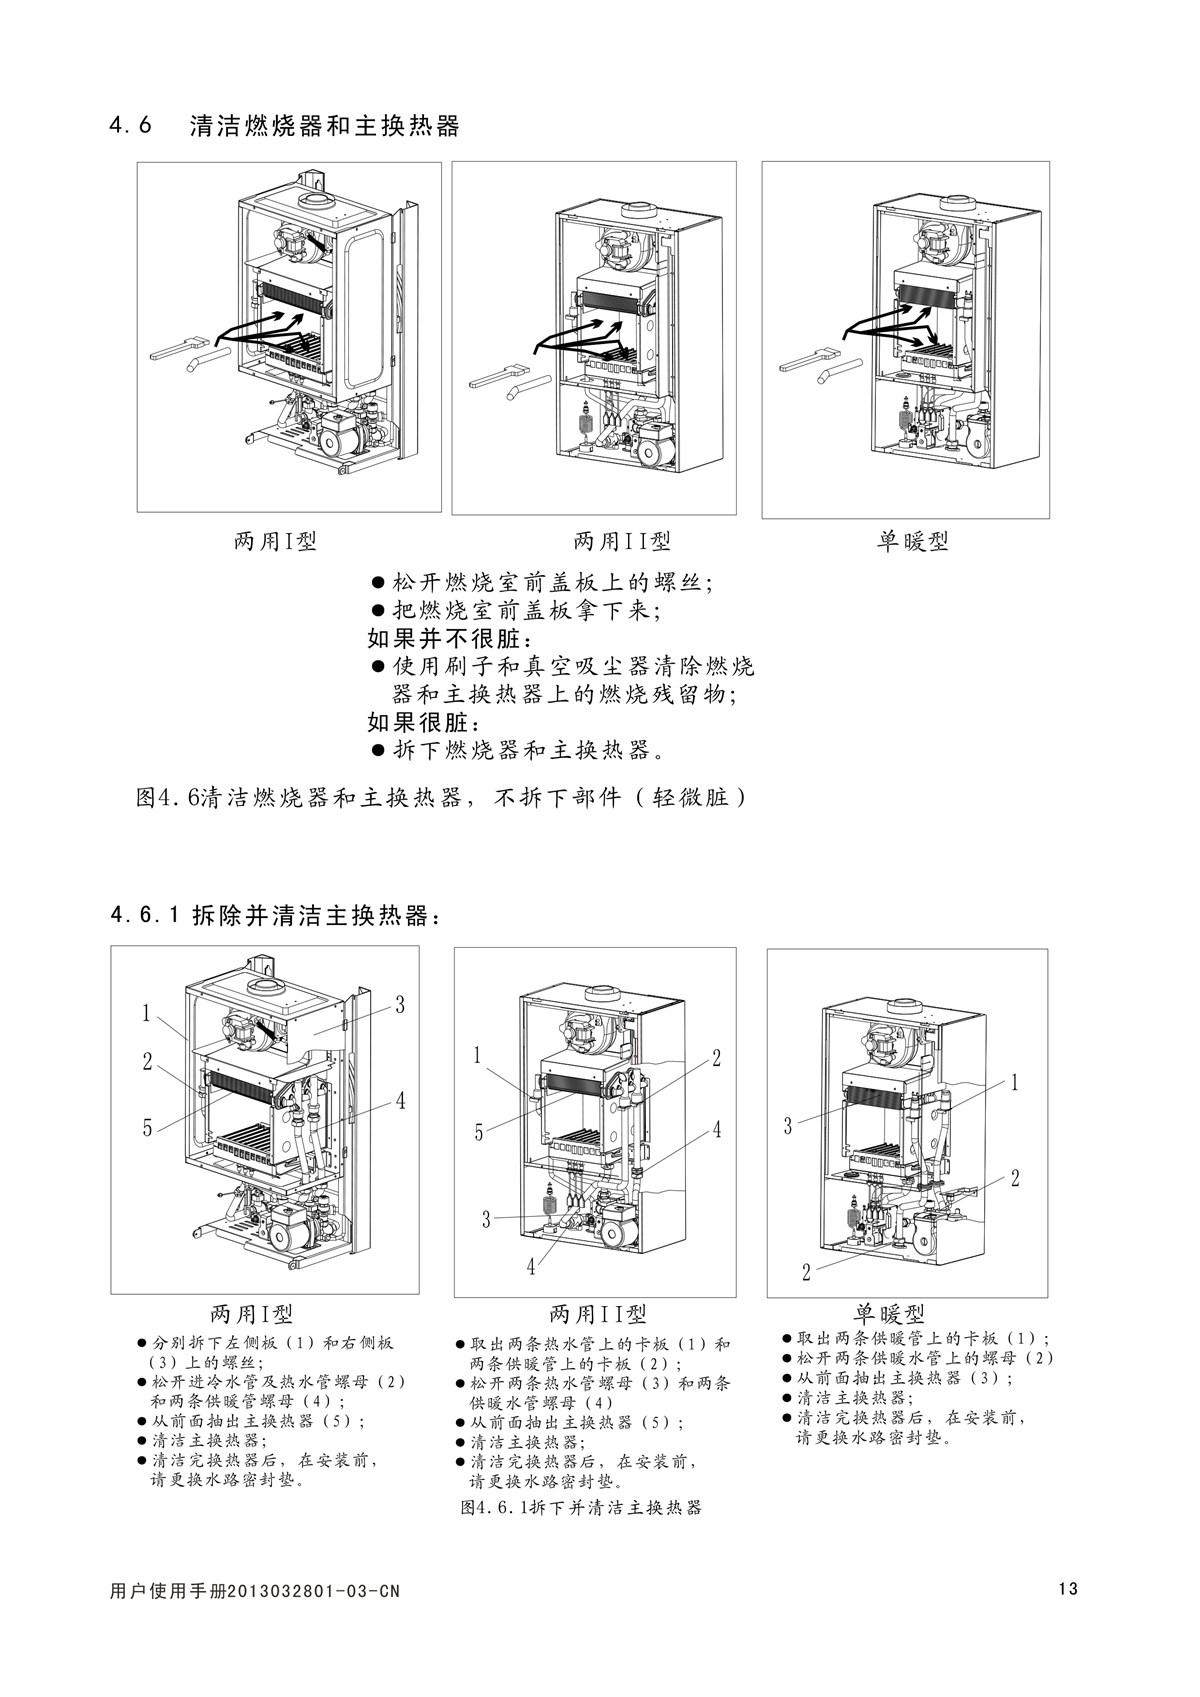 ES03系列-用户使用手册-5_02.jpg